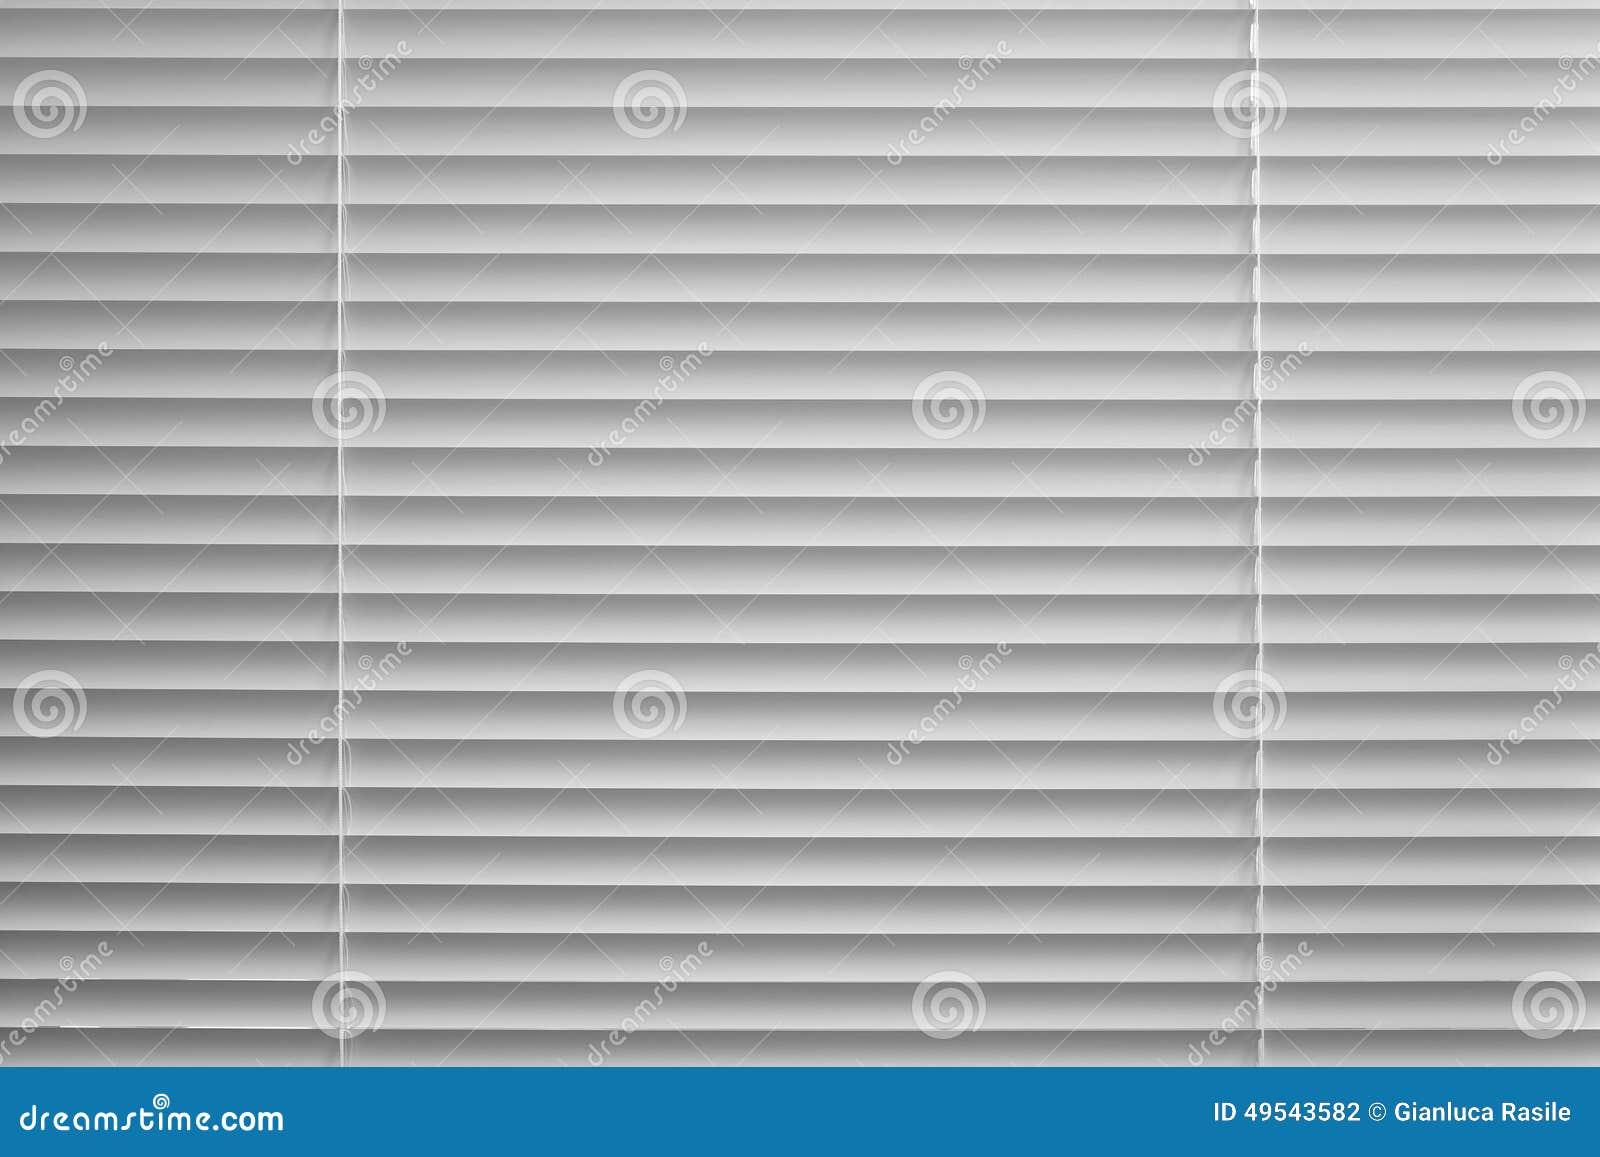 Venetian blind in black and white